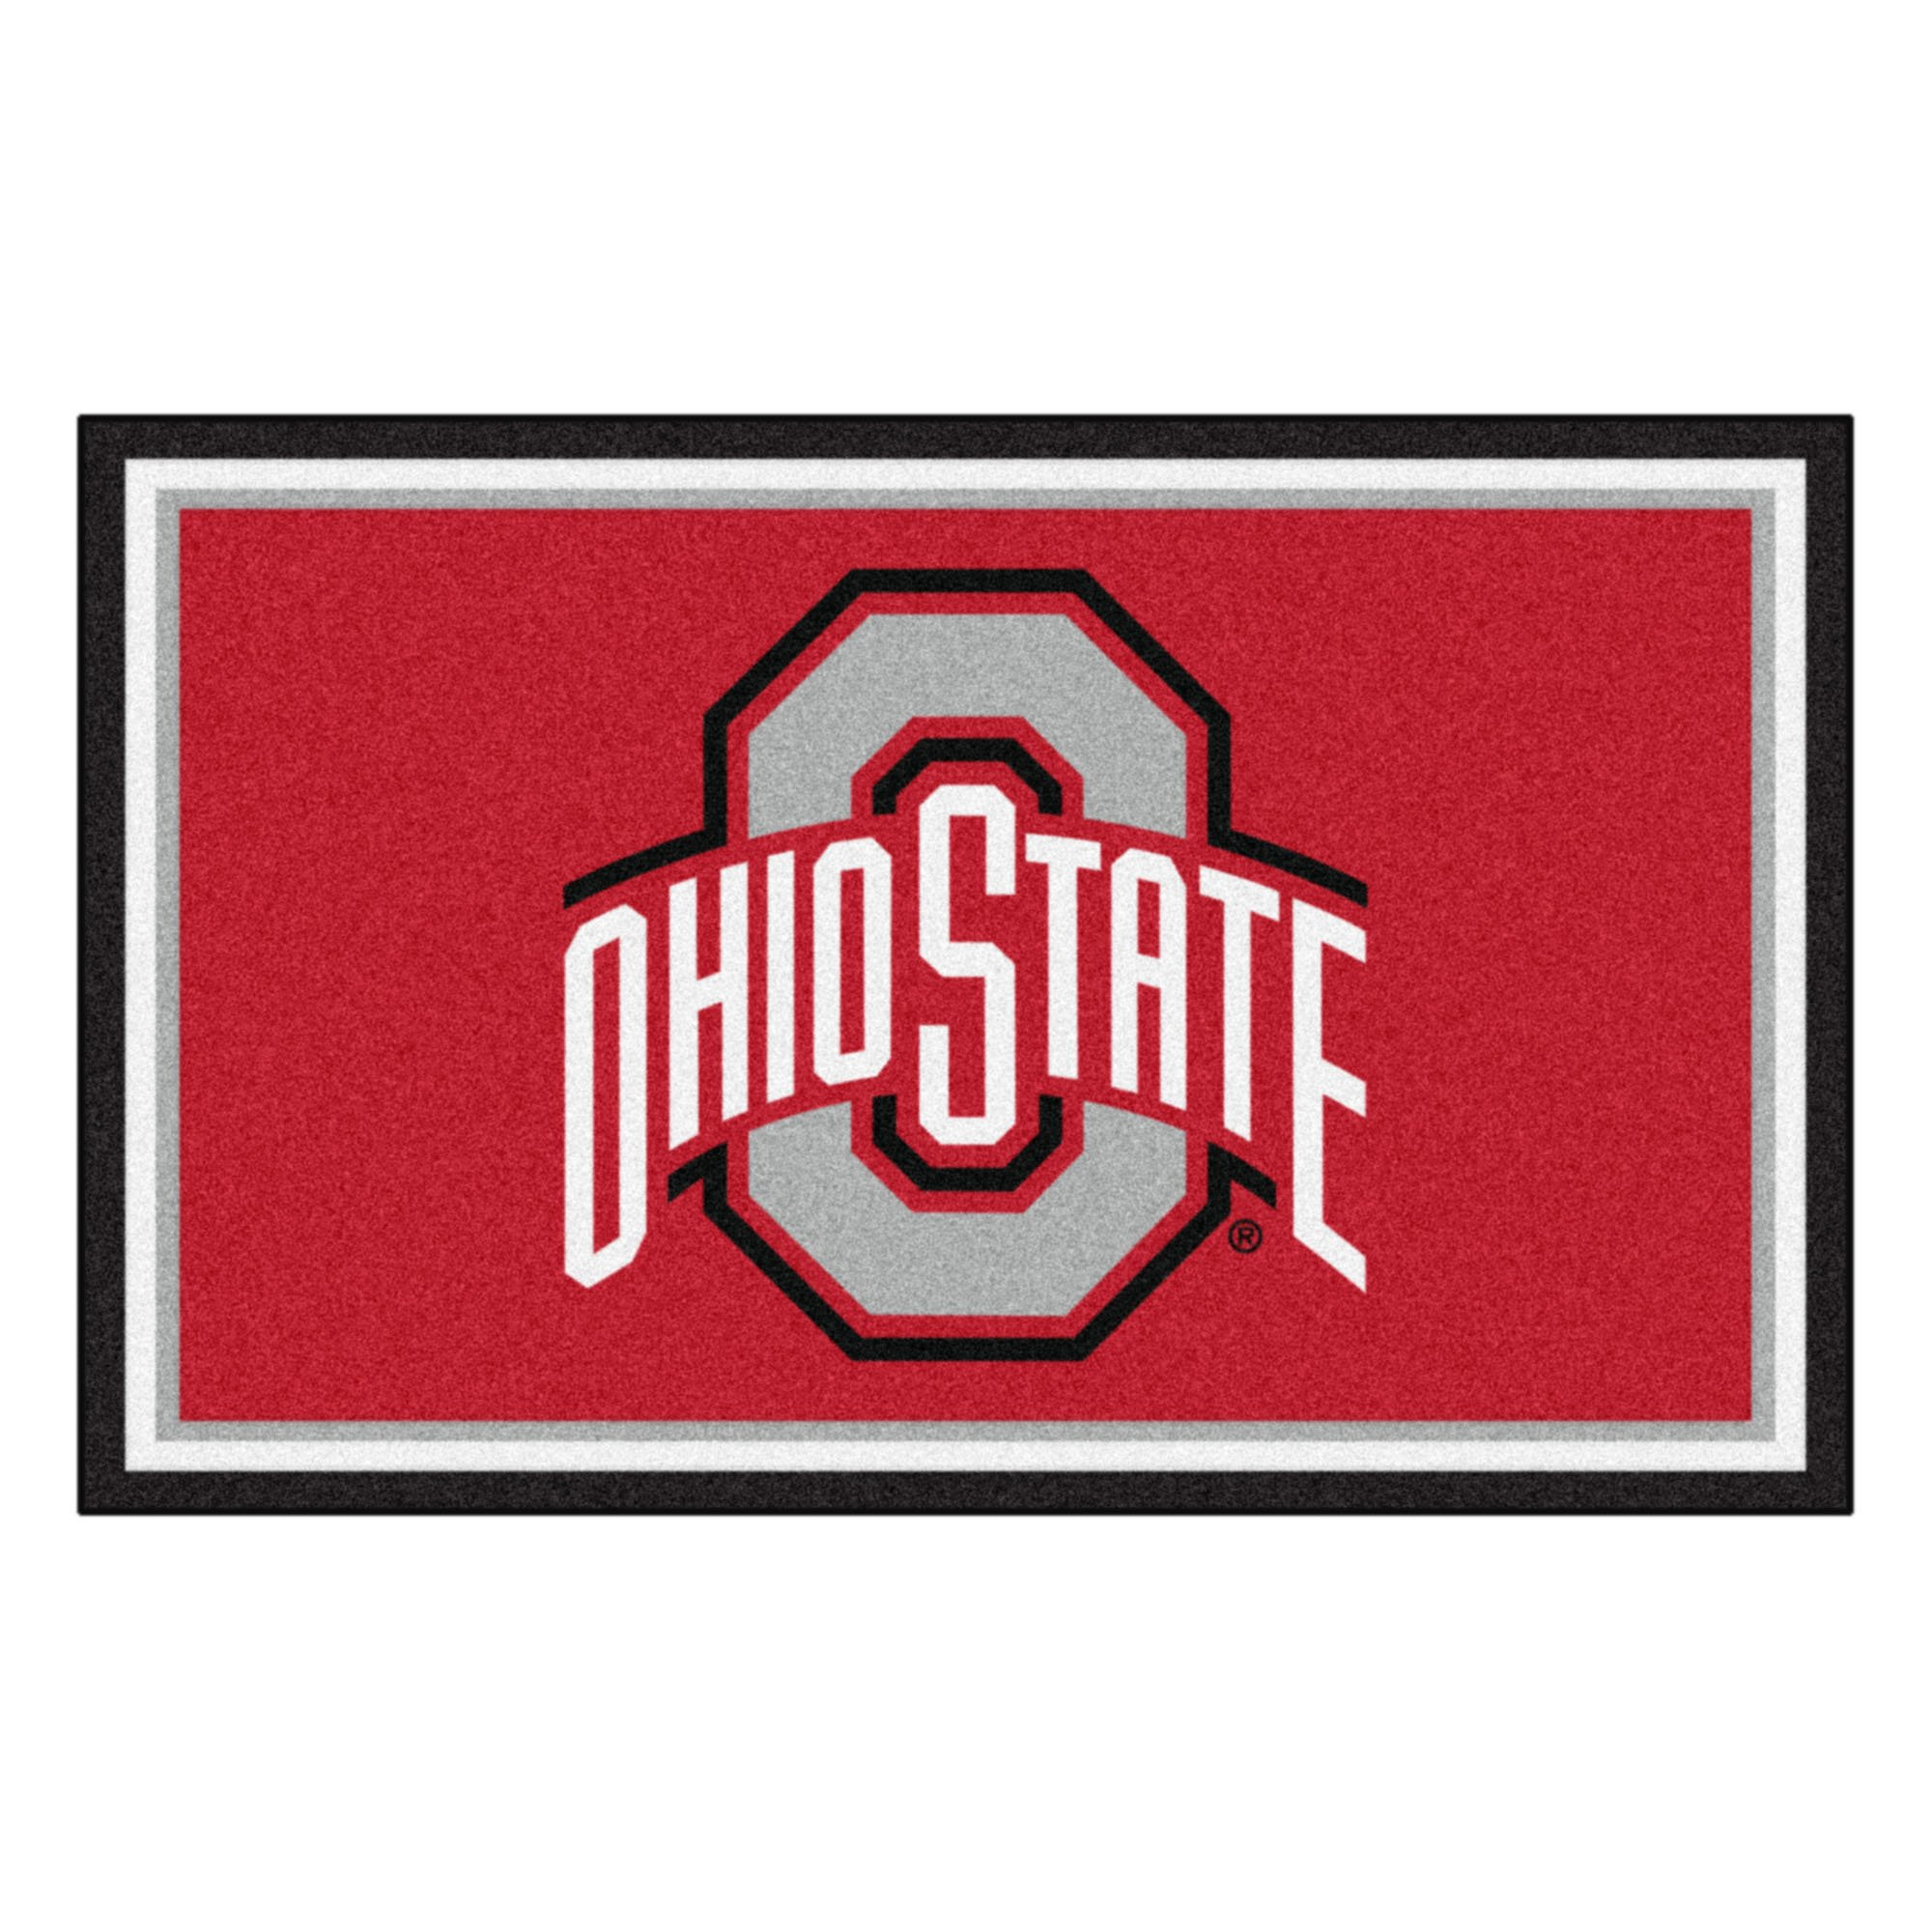 FANMATS NCAA Ohio State University Buckeyes Nylon Face 4X6 Plush Rug by FANMATS (Image #1)